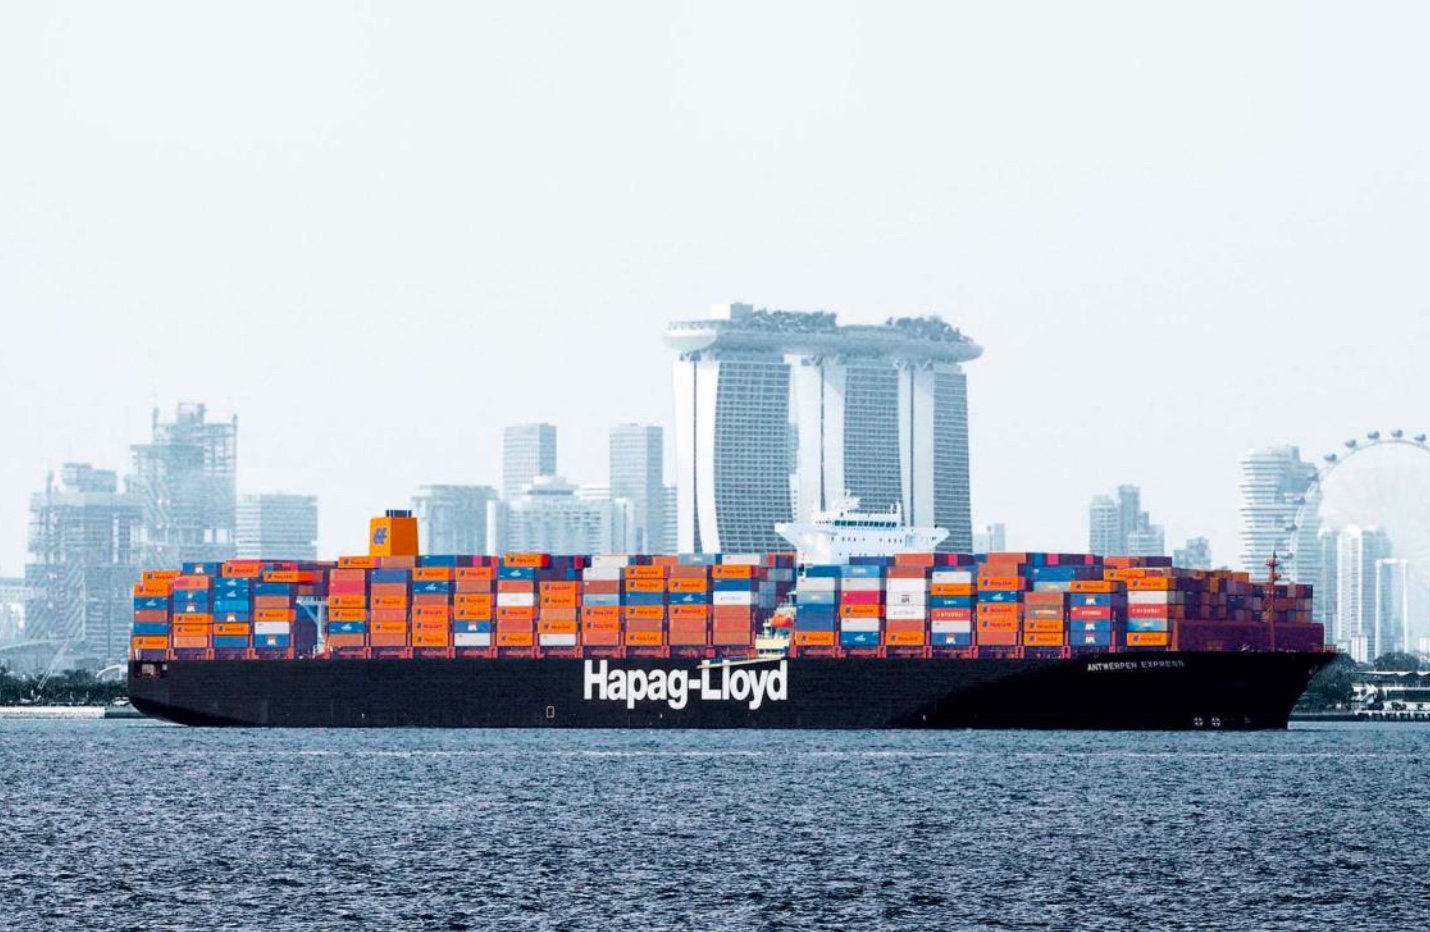 Hapag-Lloyd's positive outlook